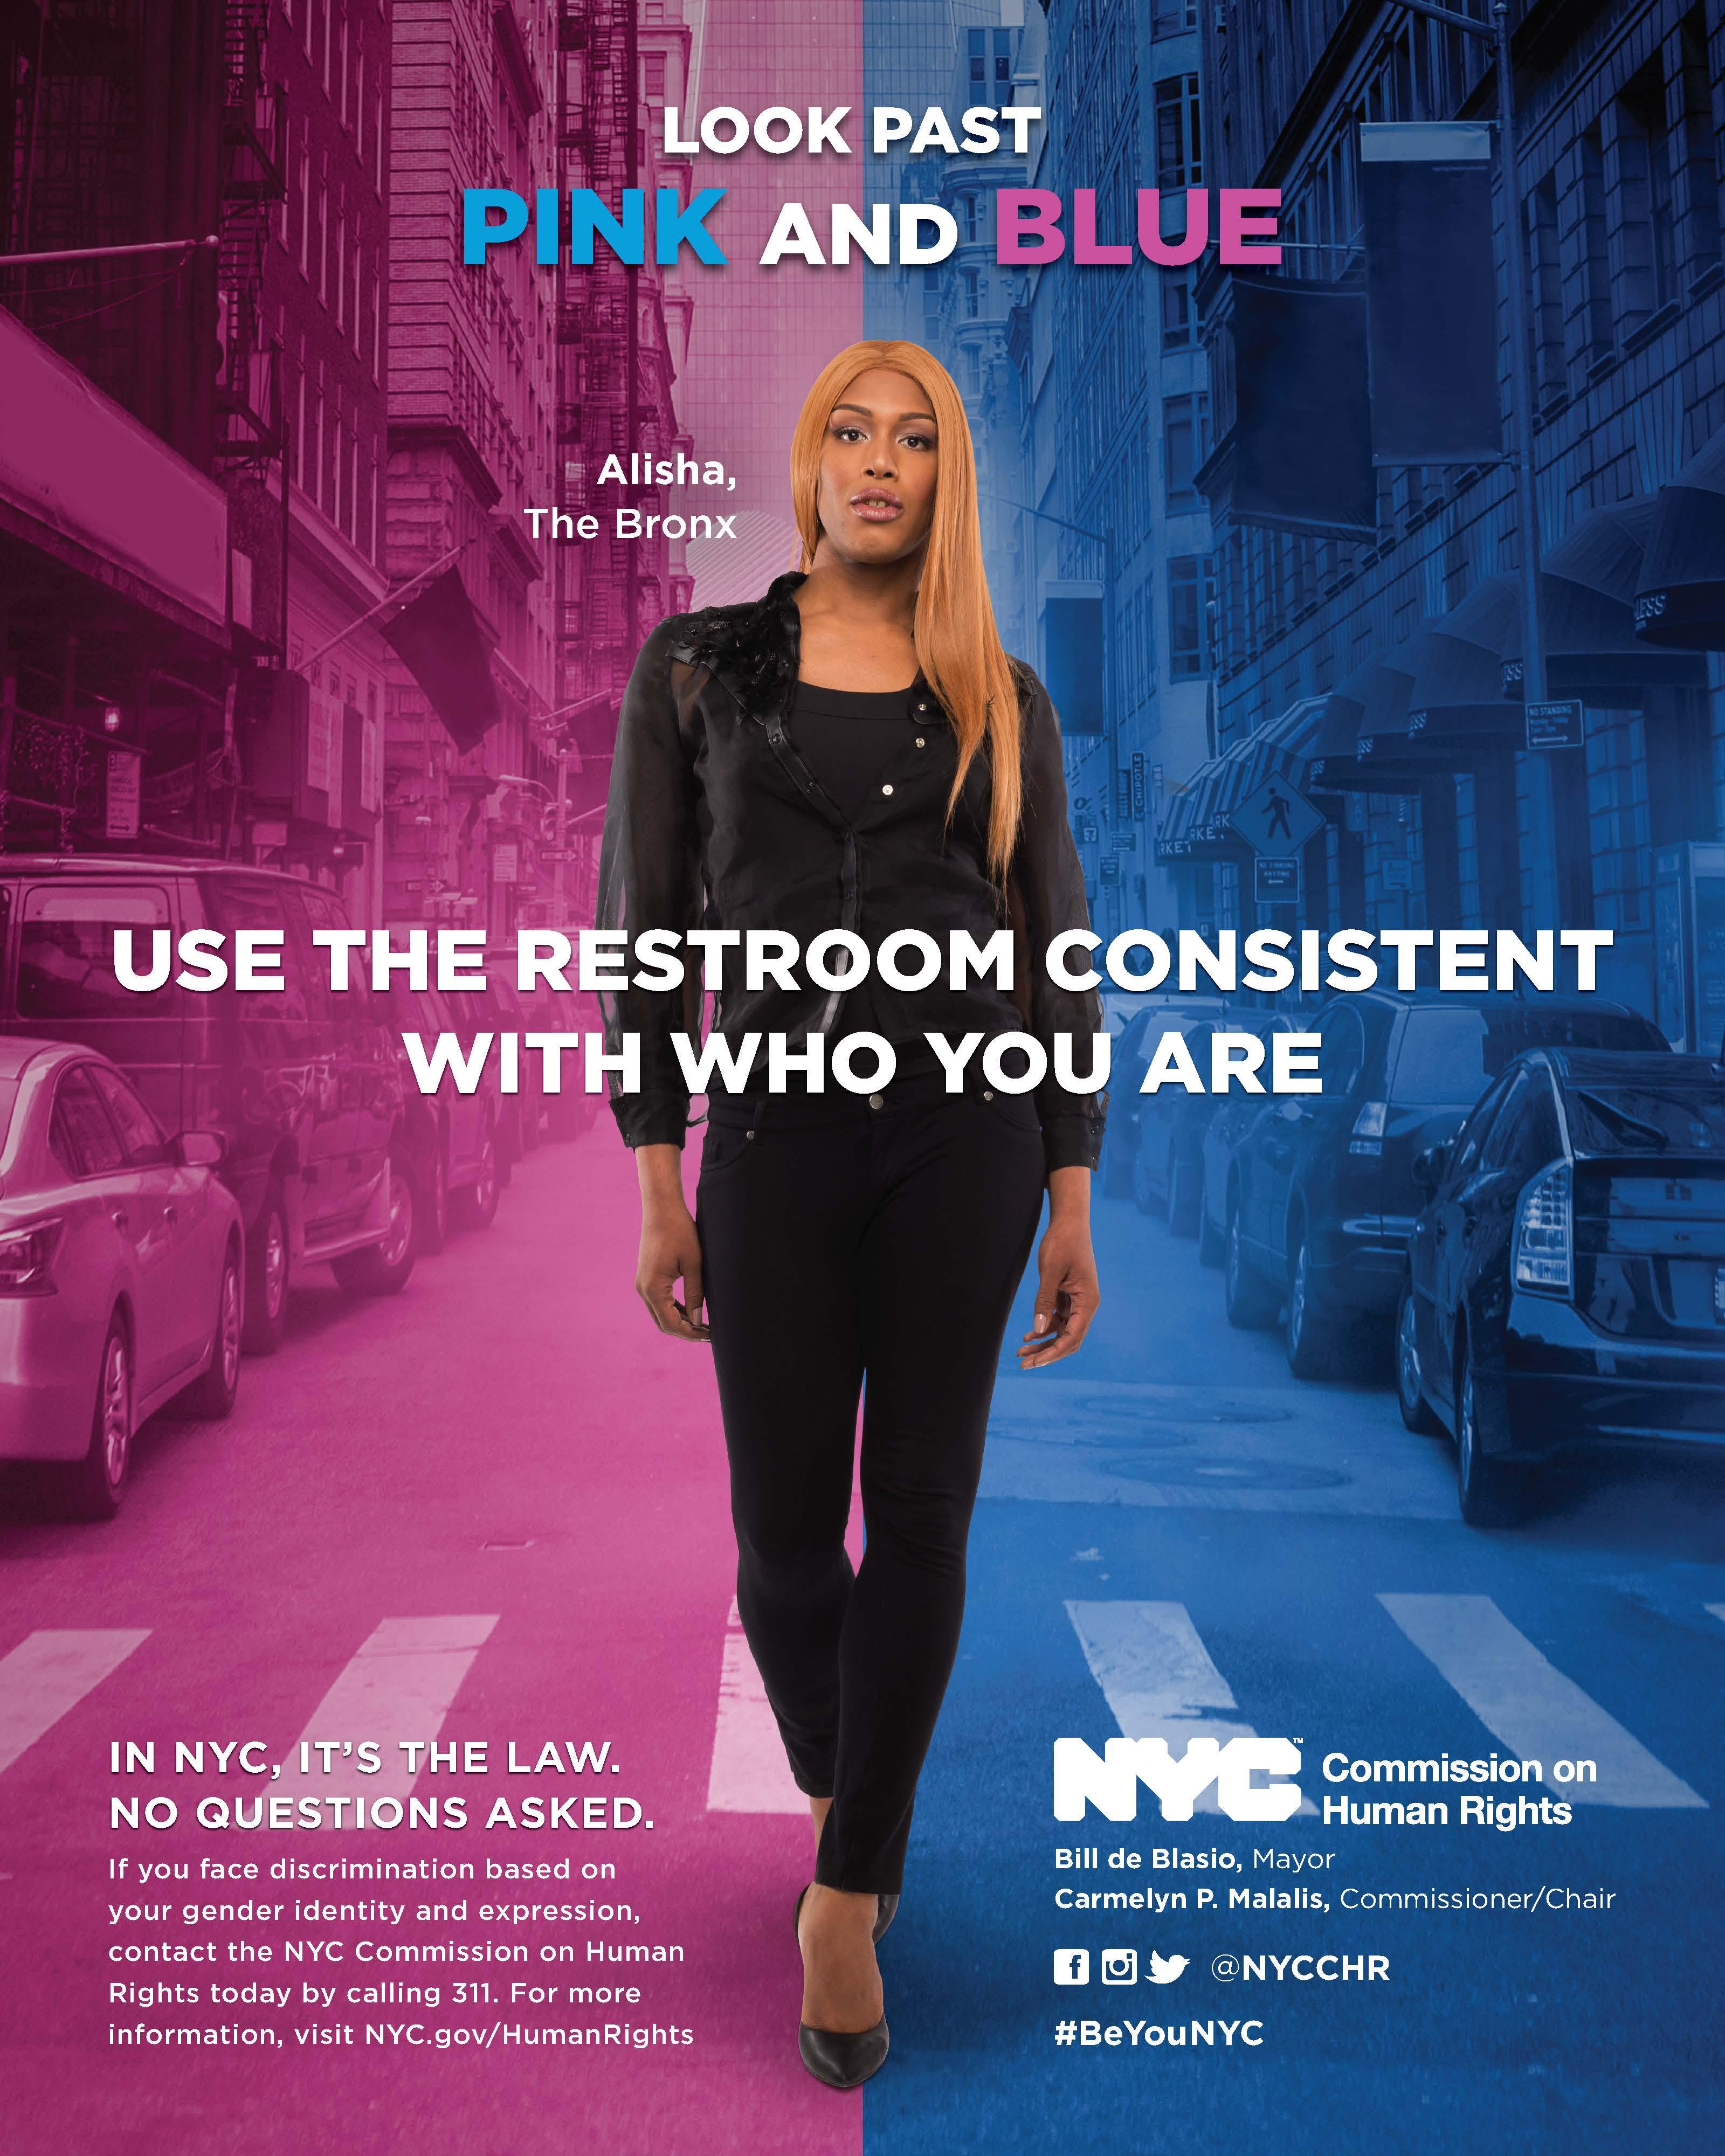 Bathroom Rights  Transgender and Gender nonconforming Discrimination  NYC Human Rights